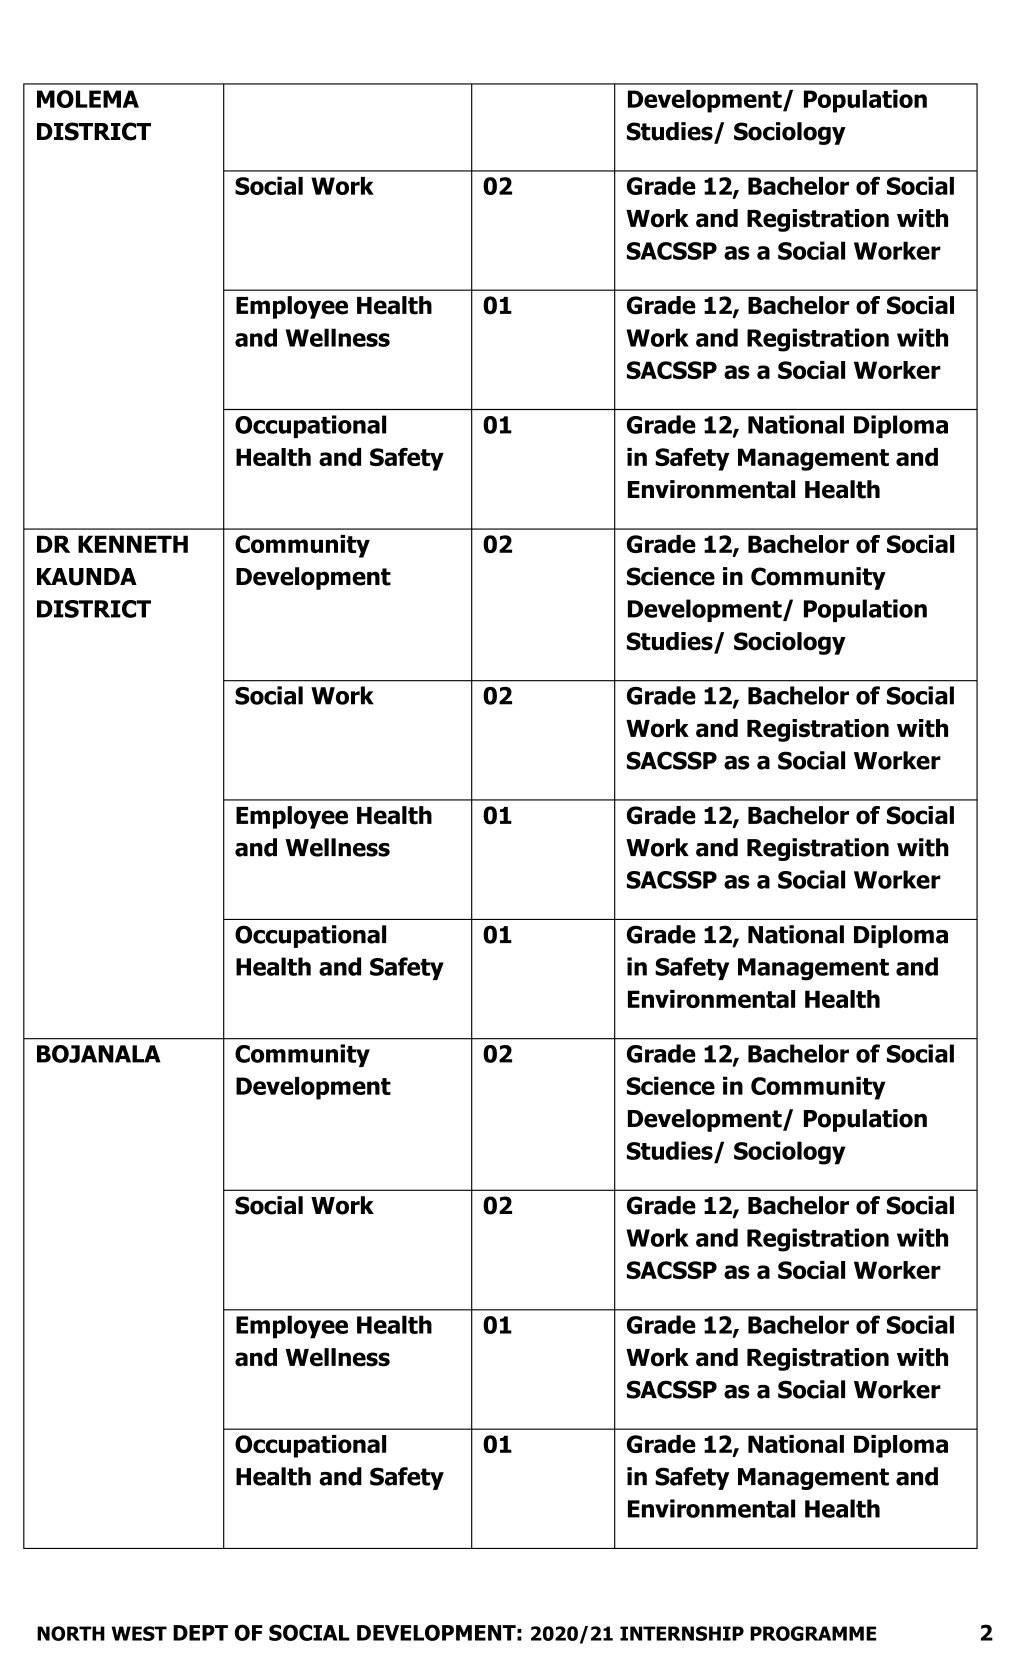 North West Department of Social Development